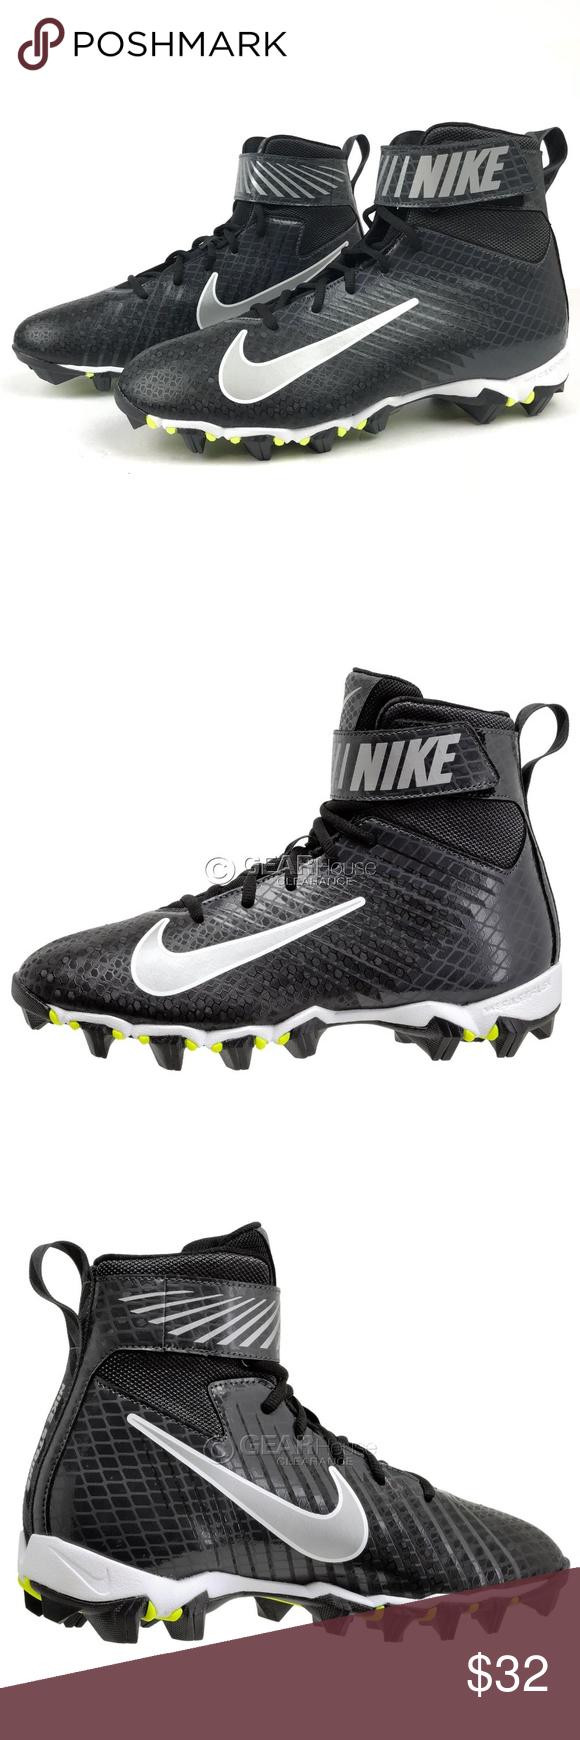 6d4fe4924e29 Nike Strike Shark Boys Football Cleats 1Y NWT!!! Nike Strike Shark Boys  Football Cleats 1Y Black Metallic Silver NWT!!! 833389 002 Nike Shoes  Sneakers